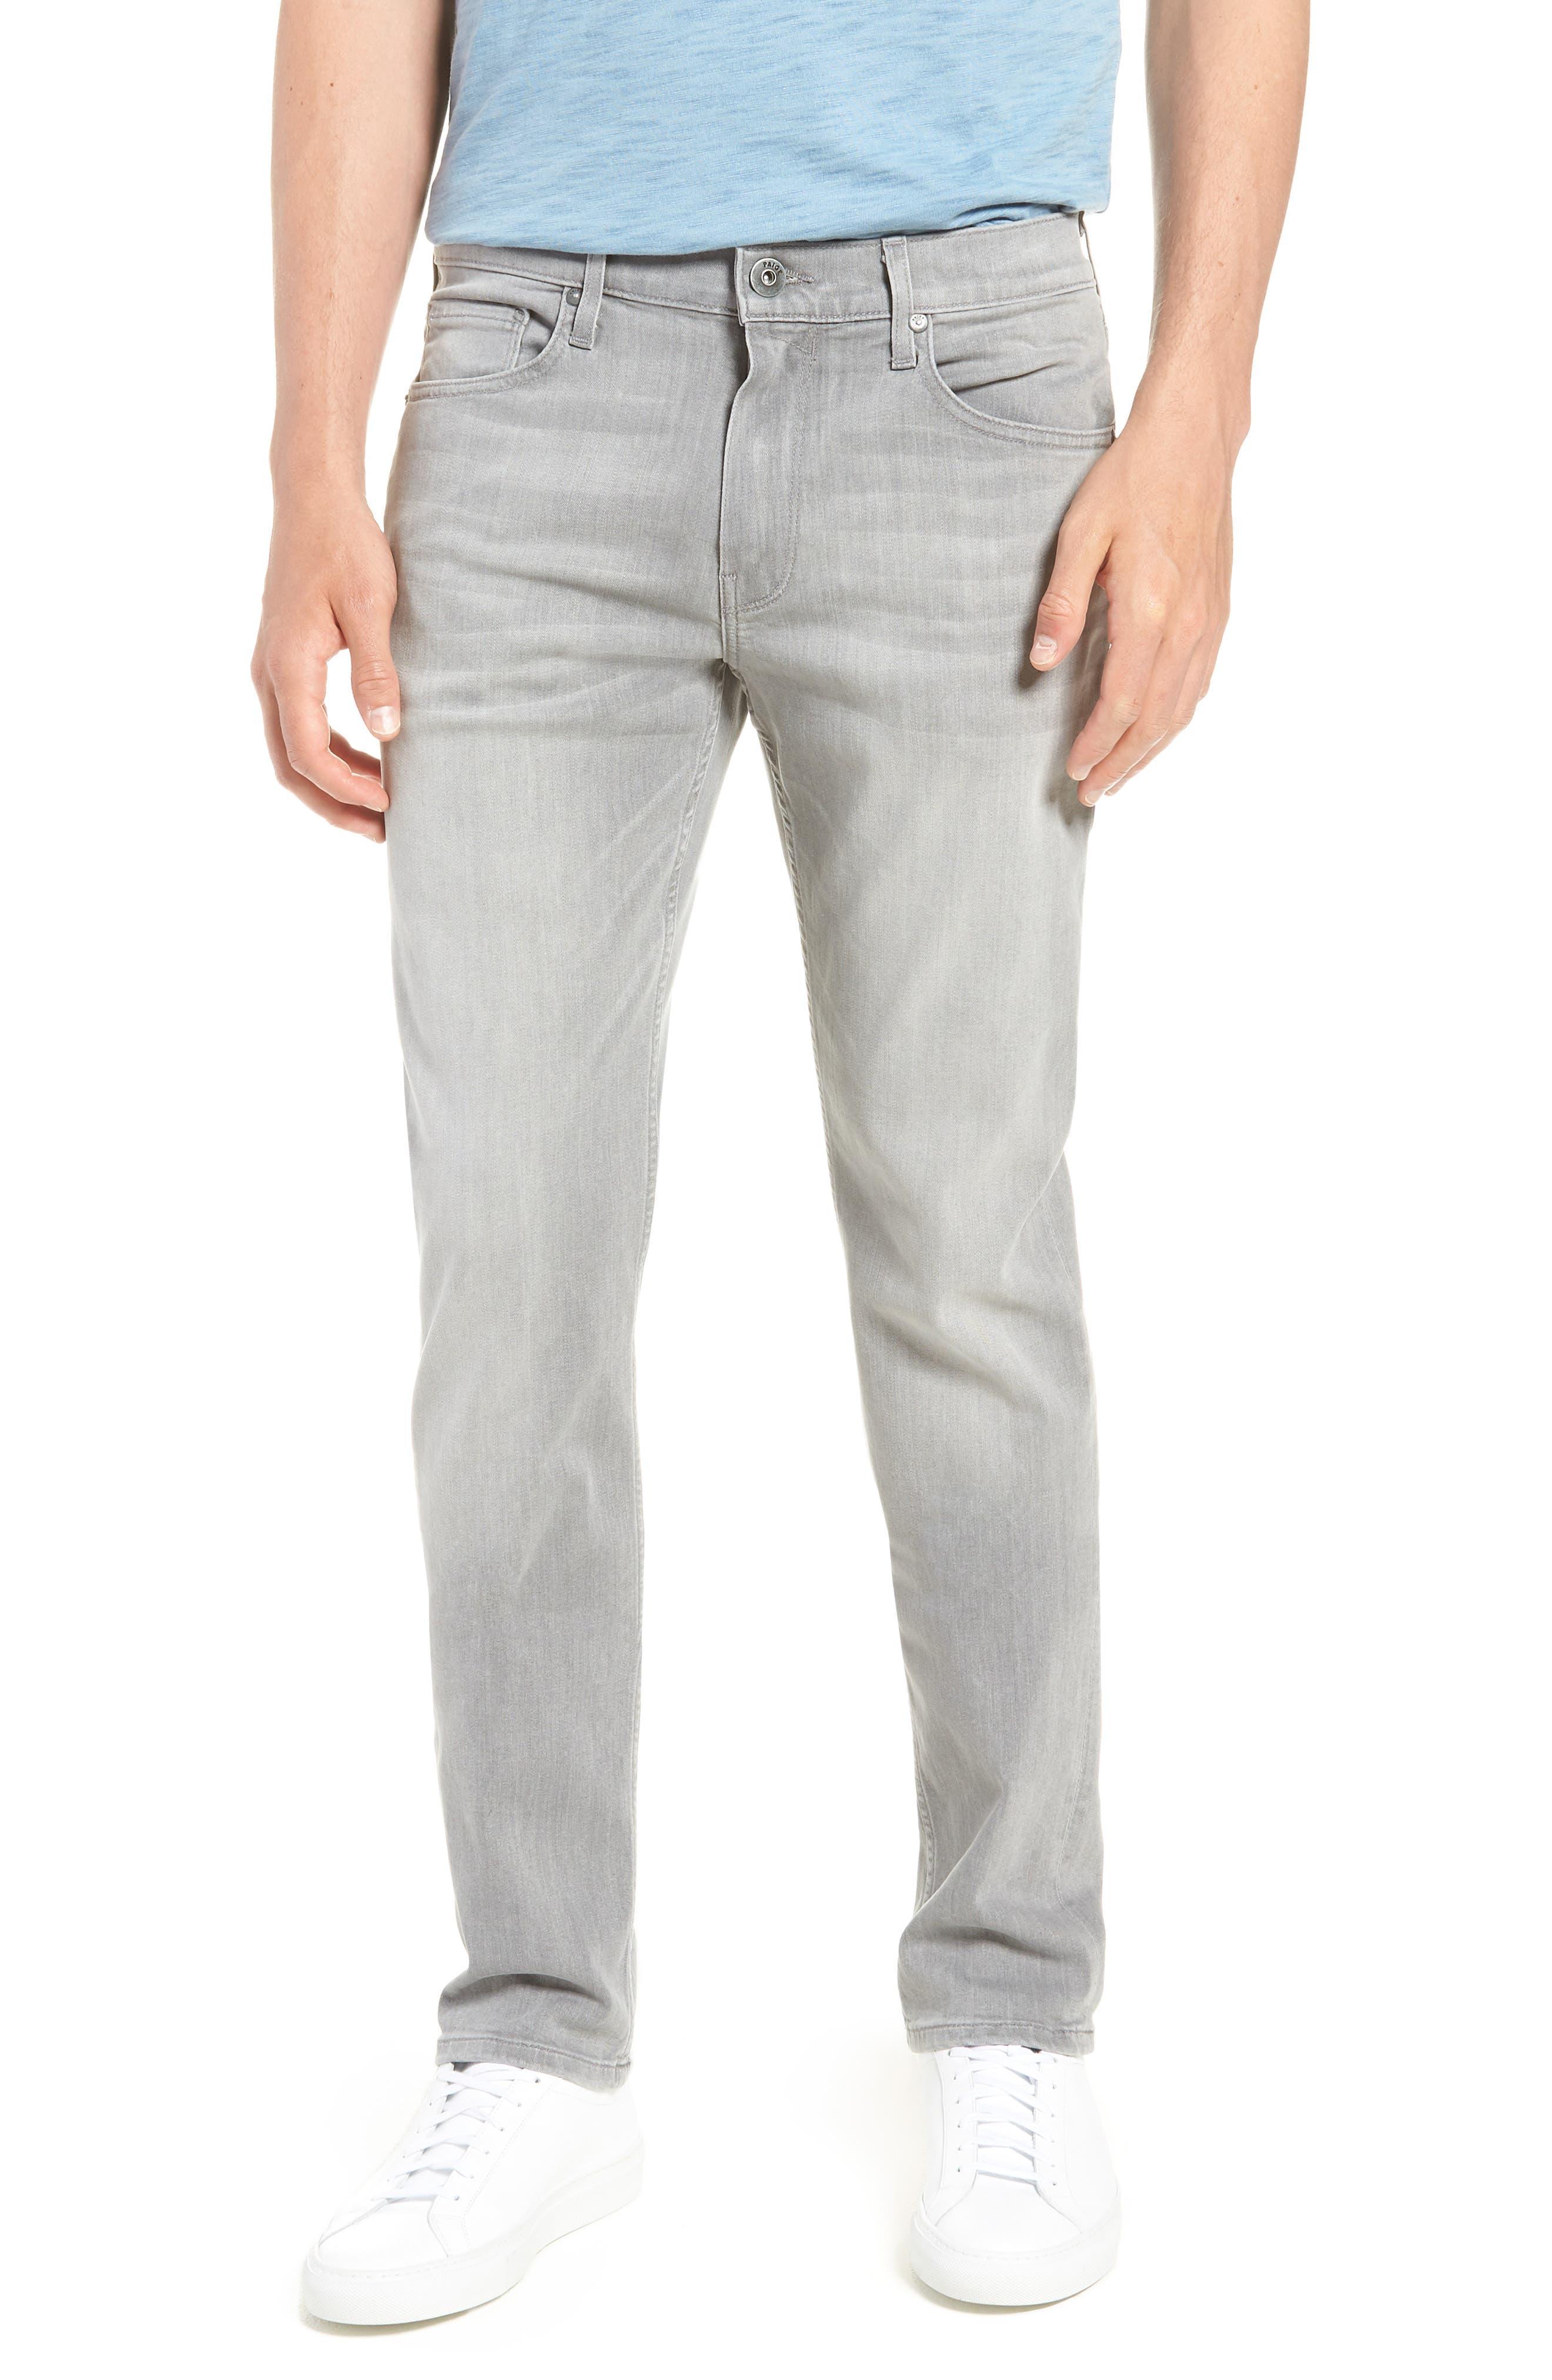 Transcend - Lennox Slim Fit Jeans,                         Main,                         color, Mannor